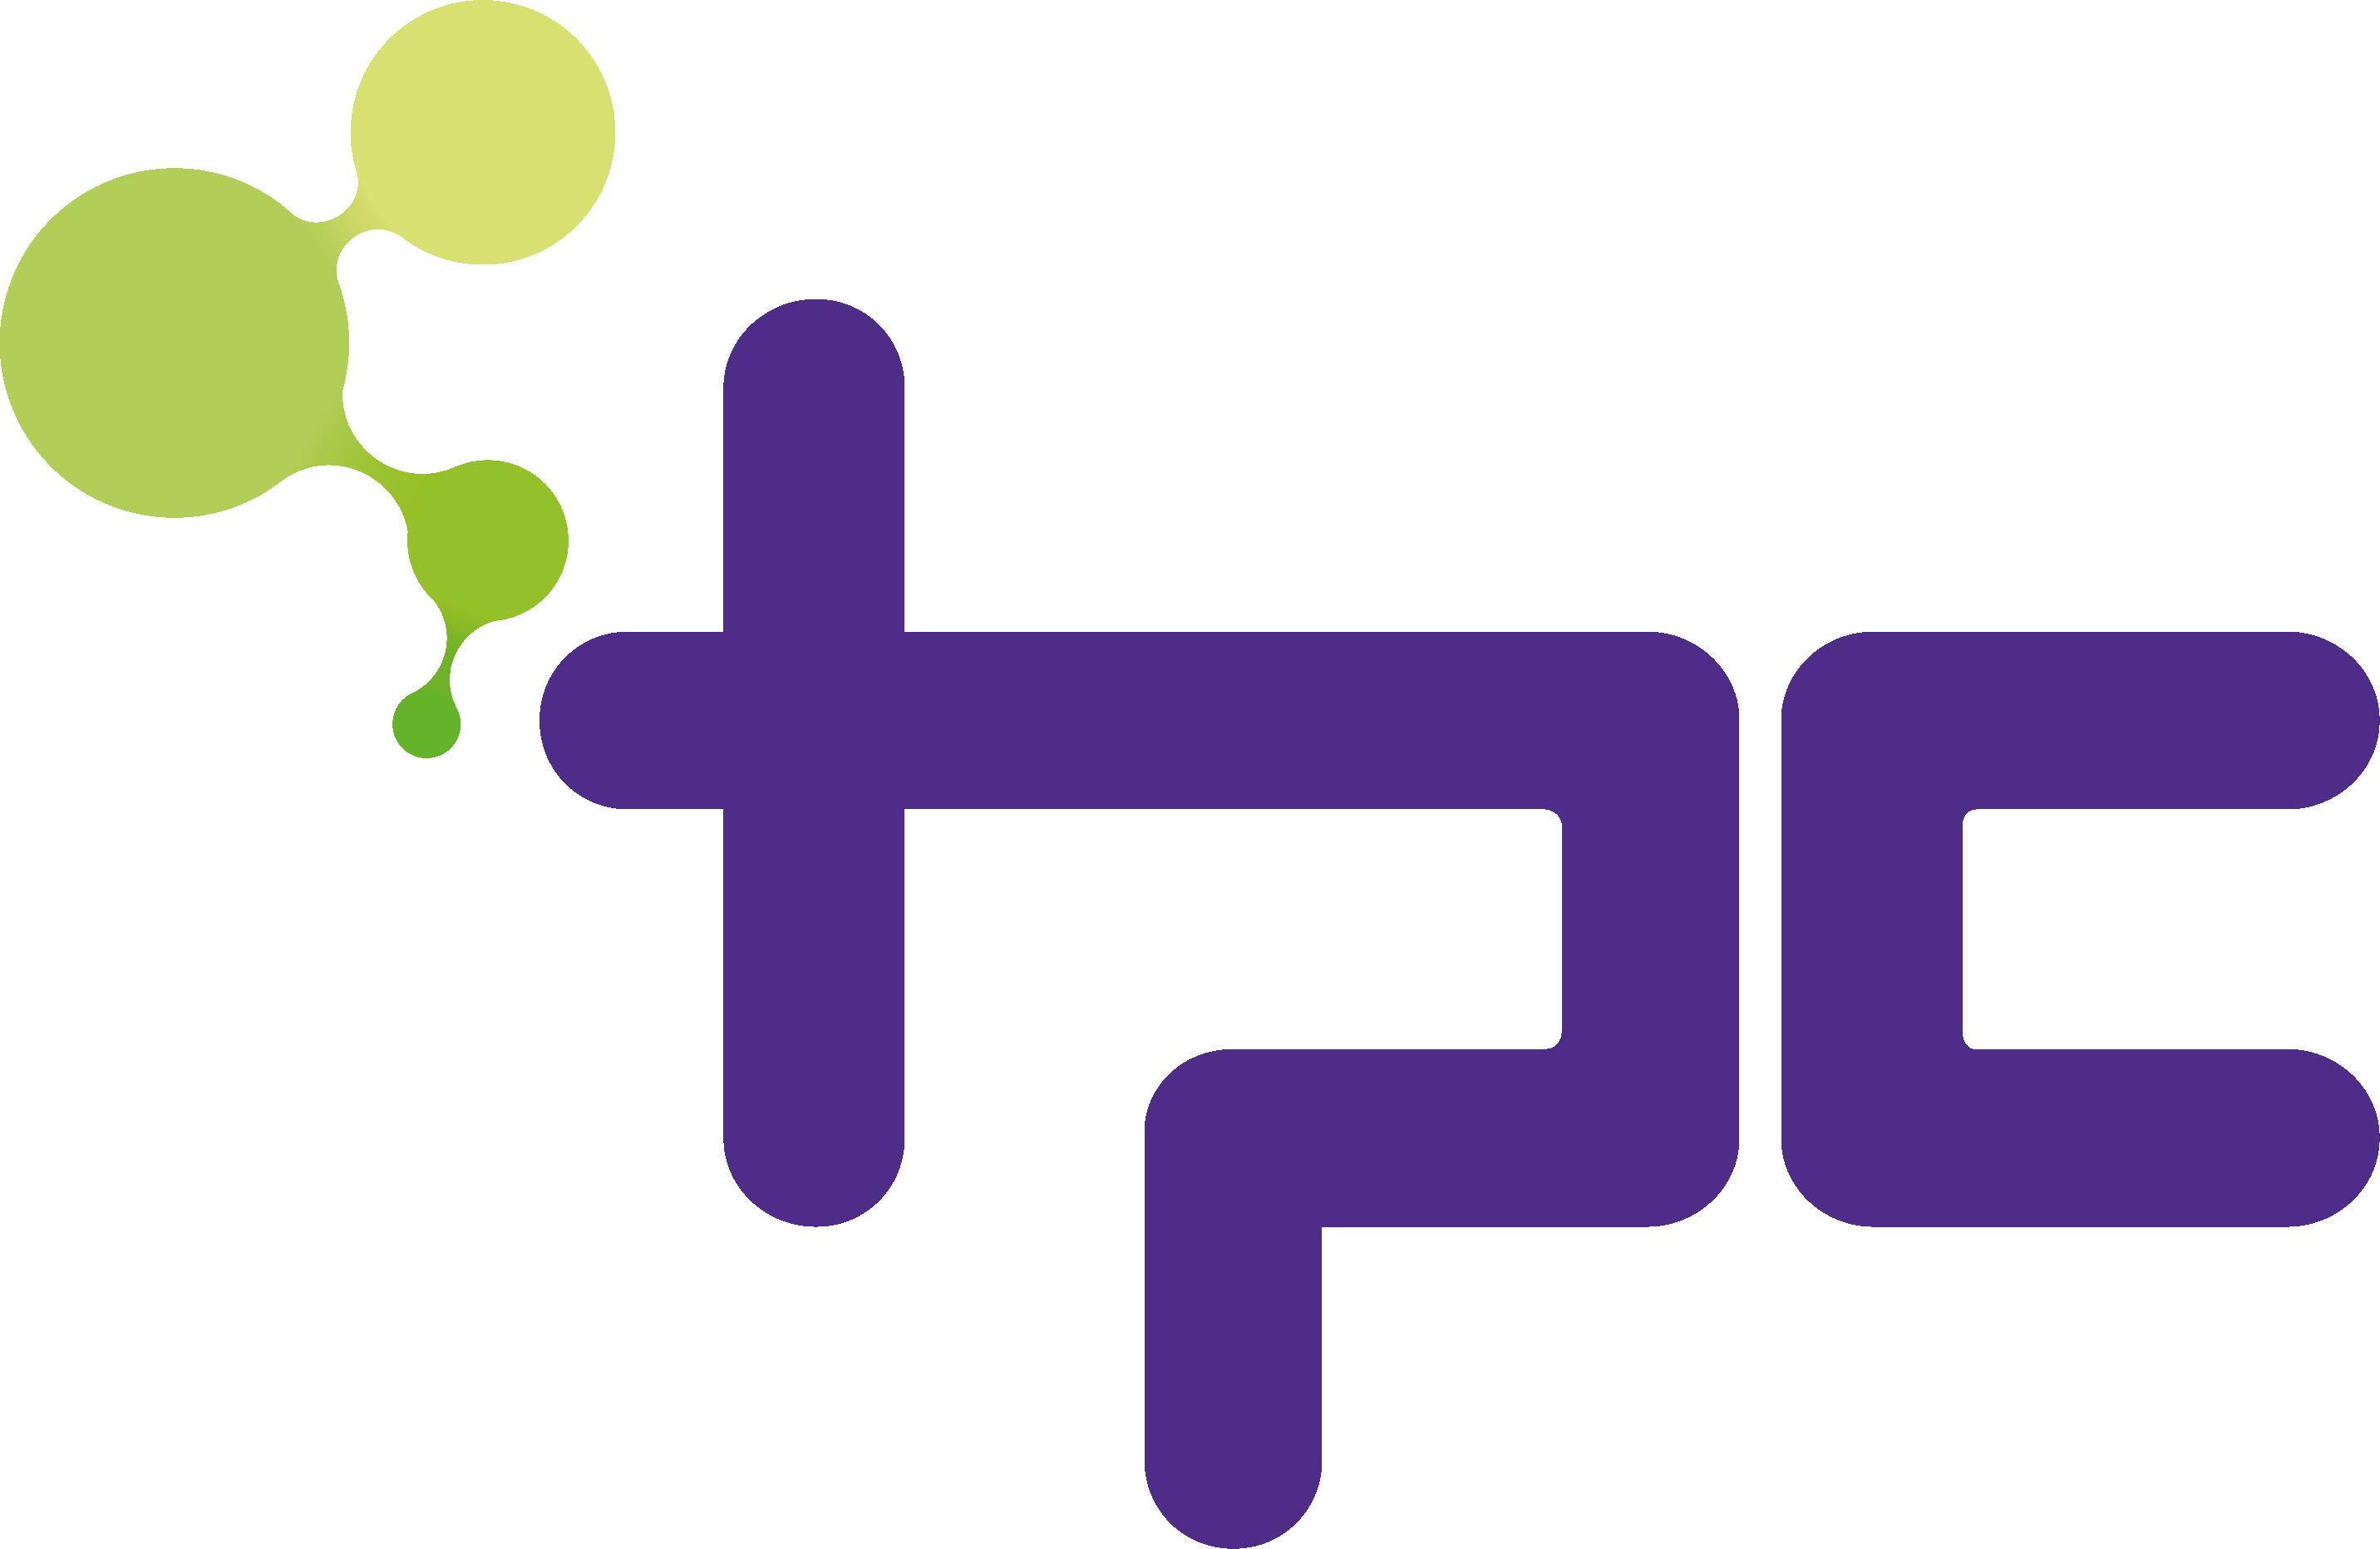 Logo Transports publics du Chablais SA